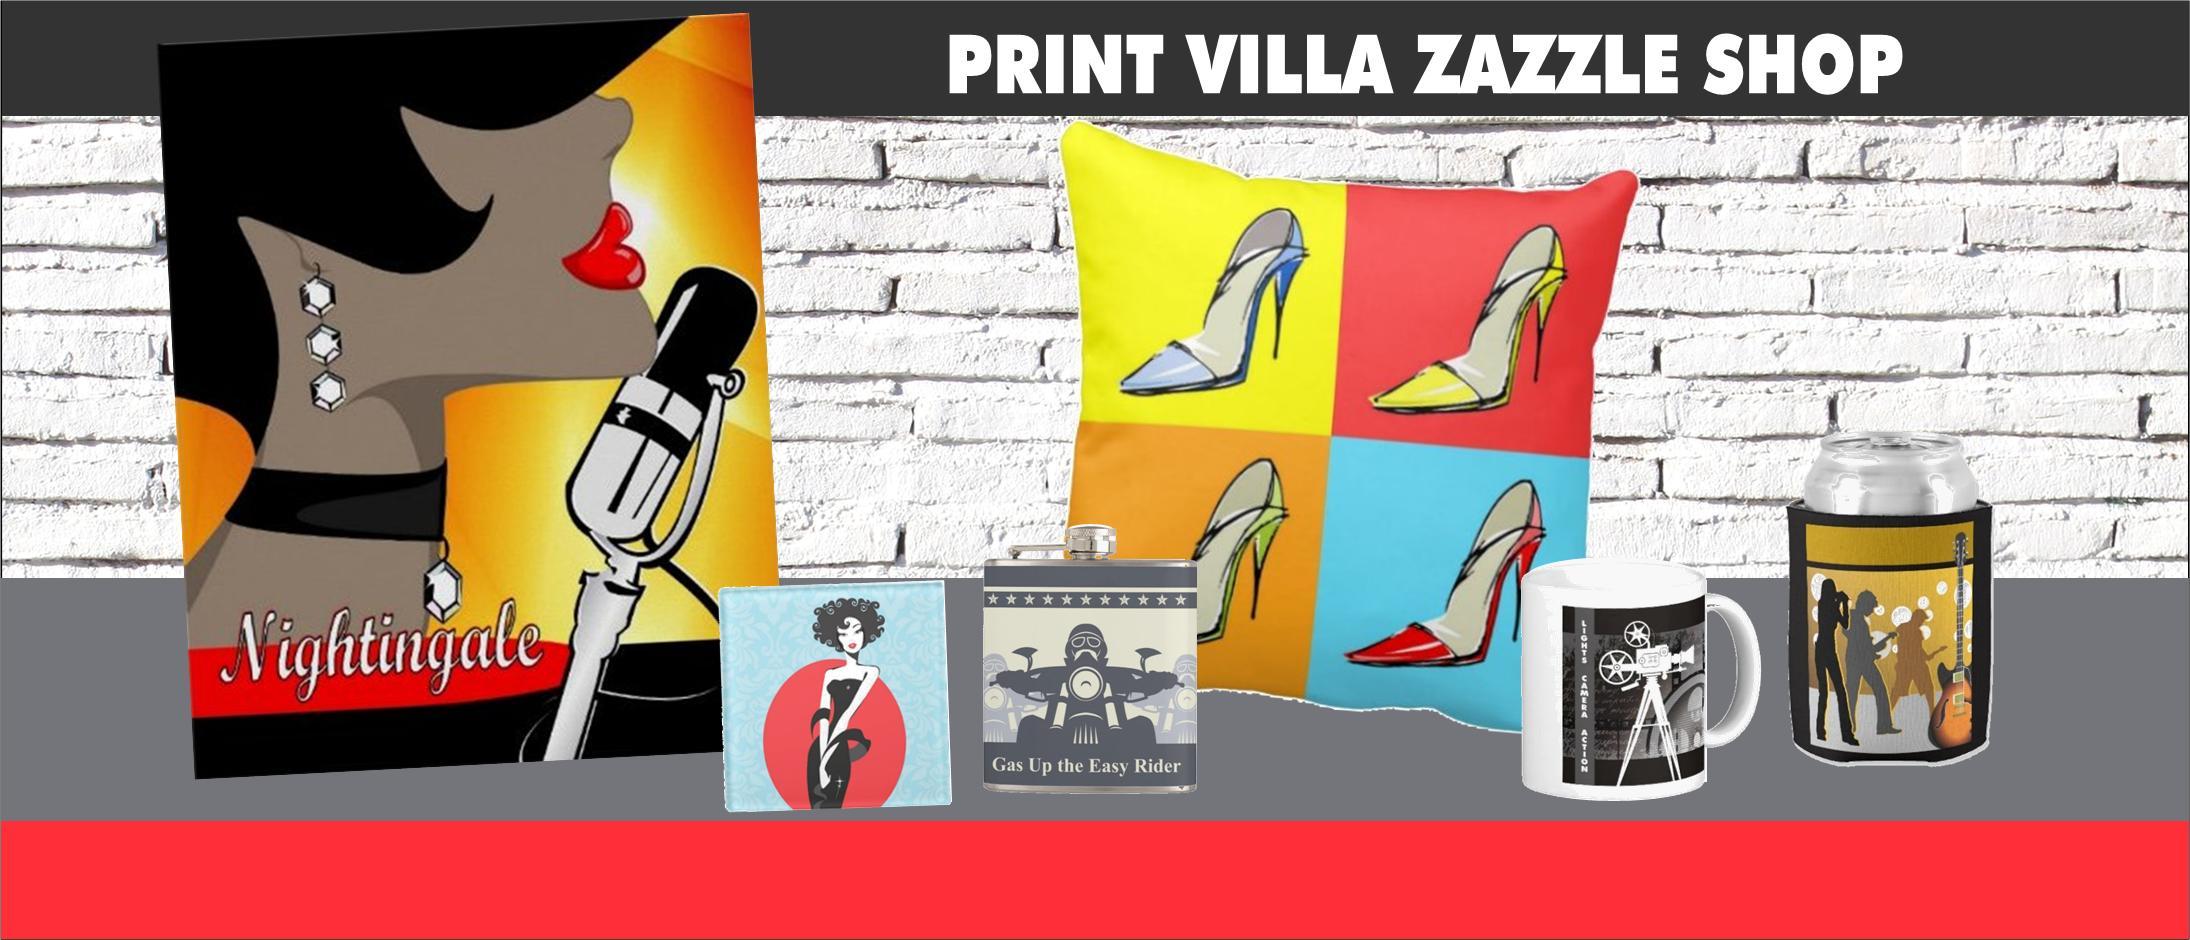 Print Villa Zazzle Shop